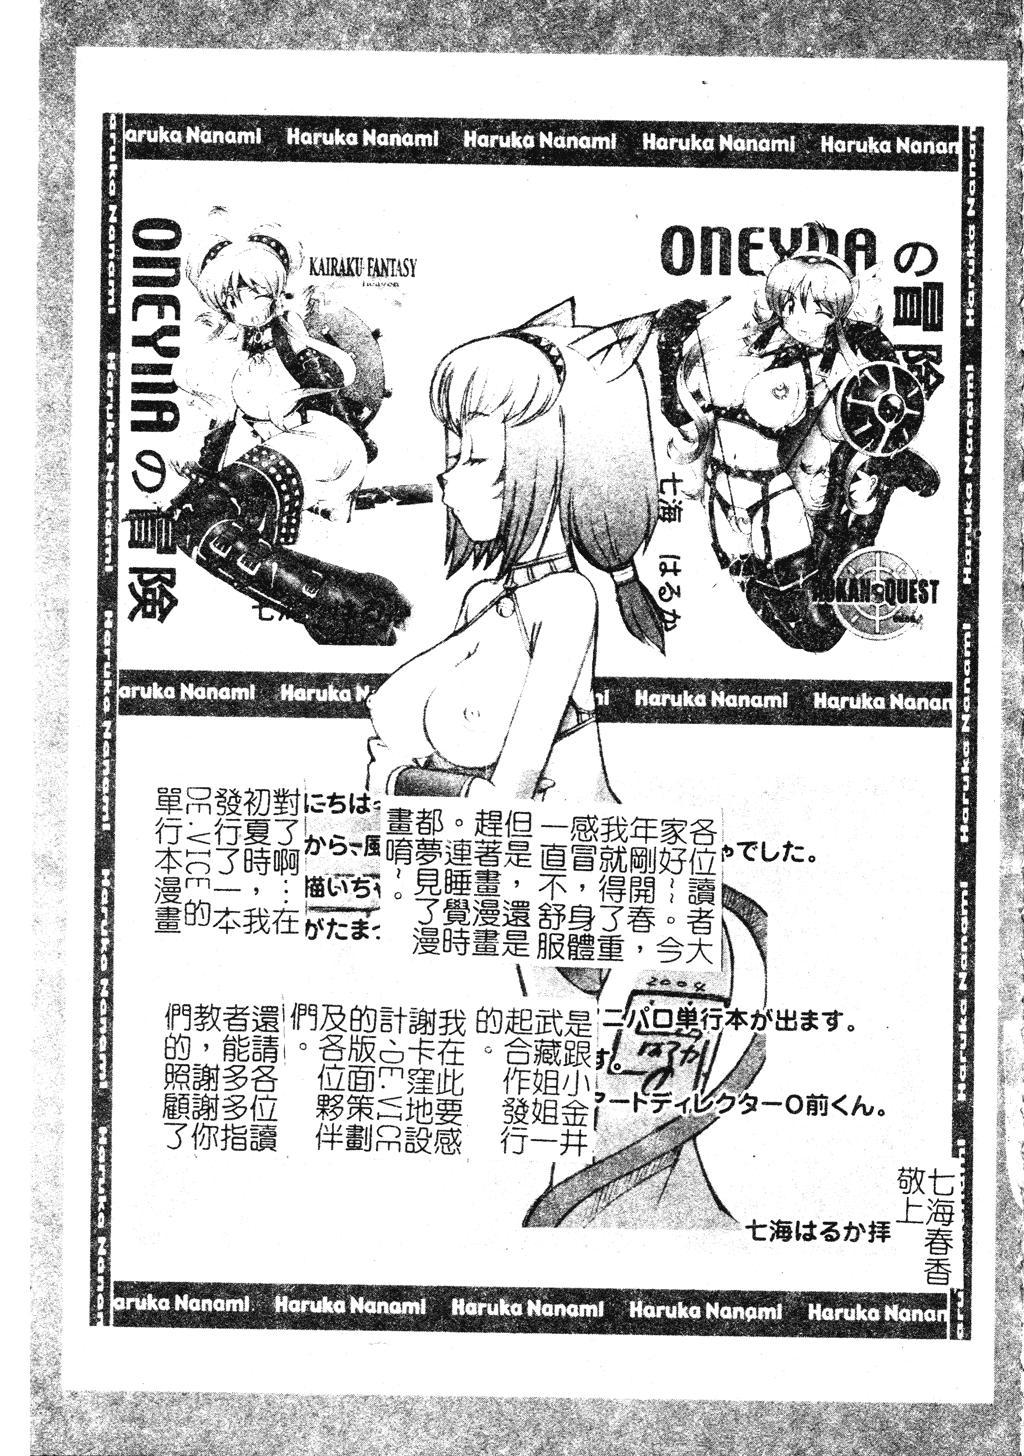 DenNow Koihime Collection 7 127